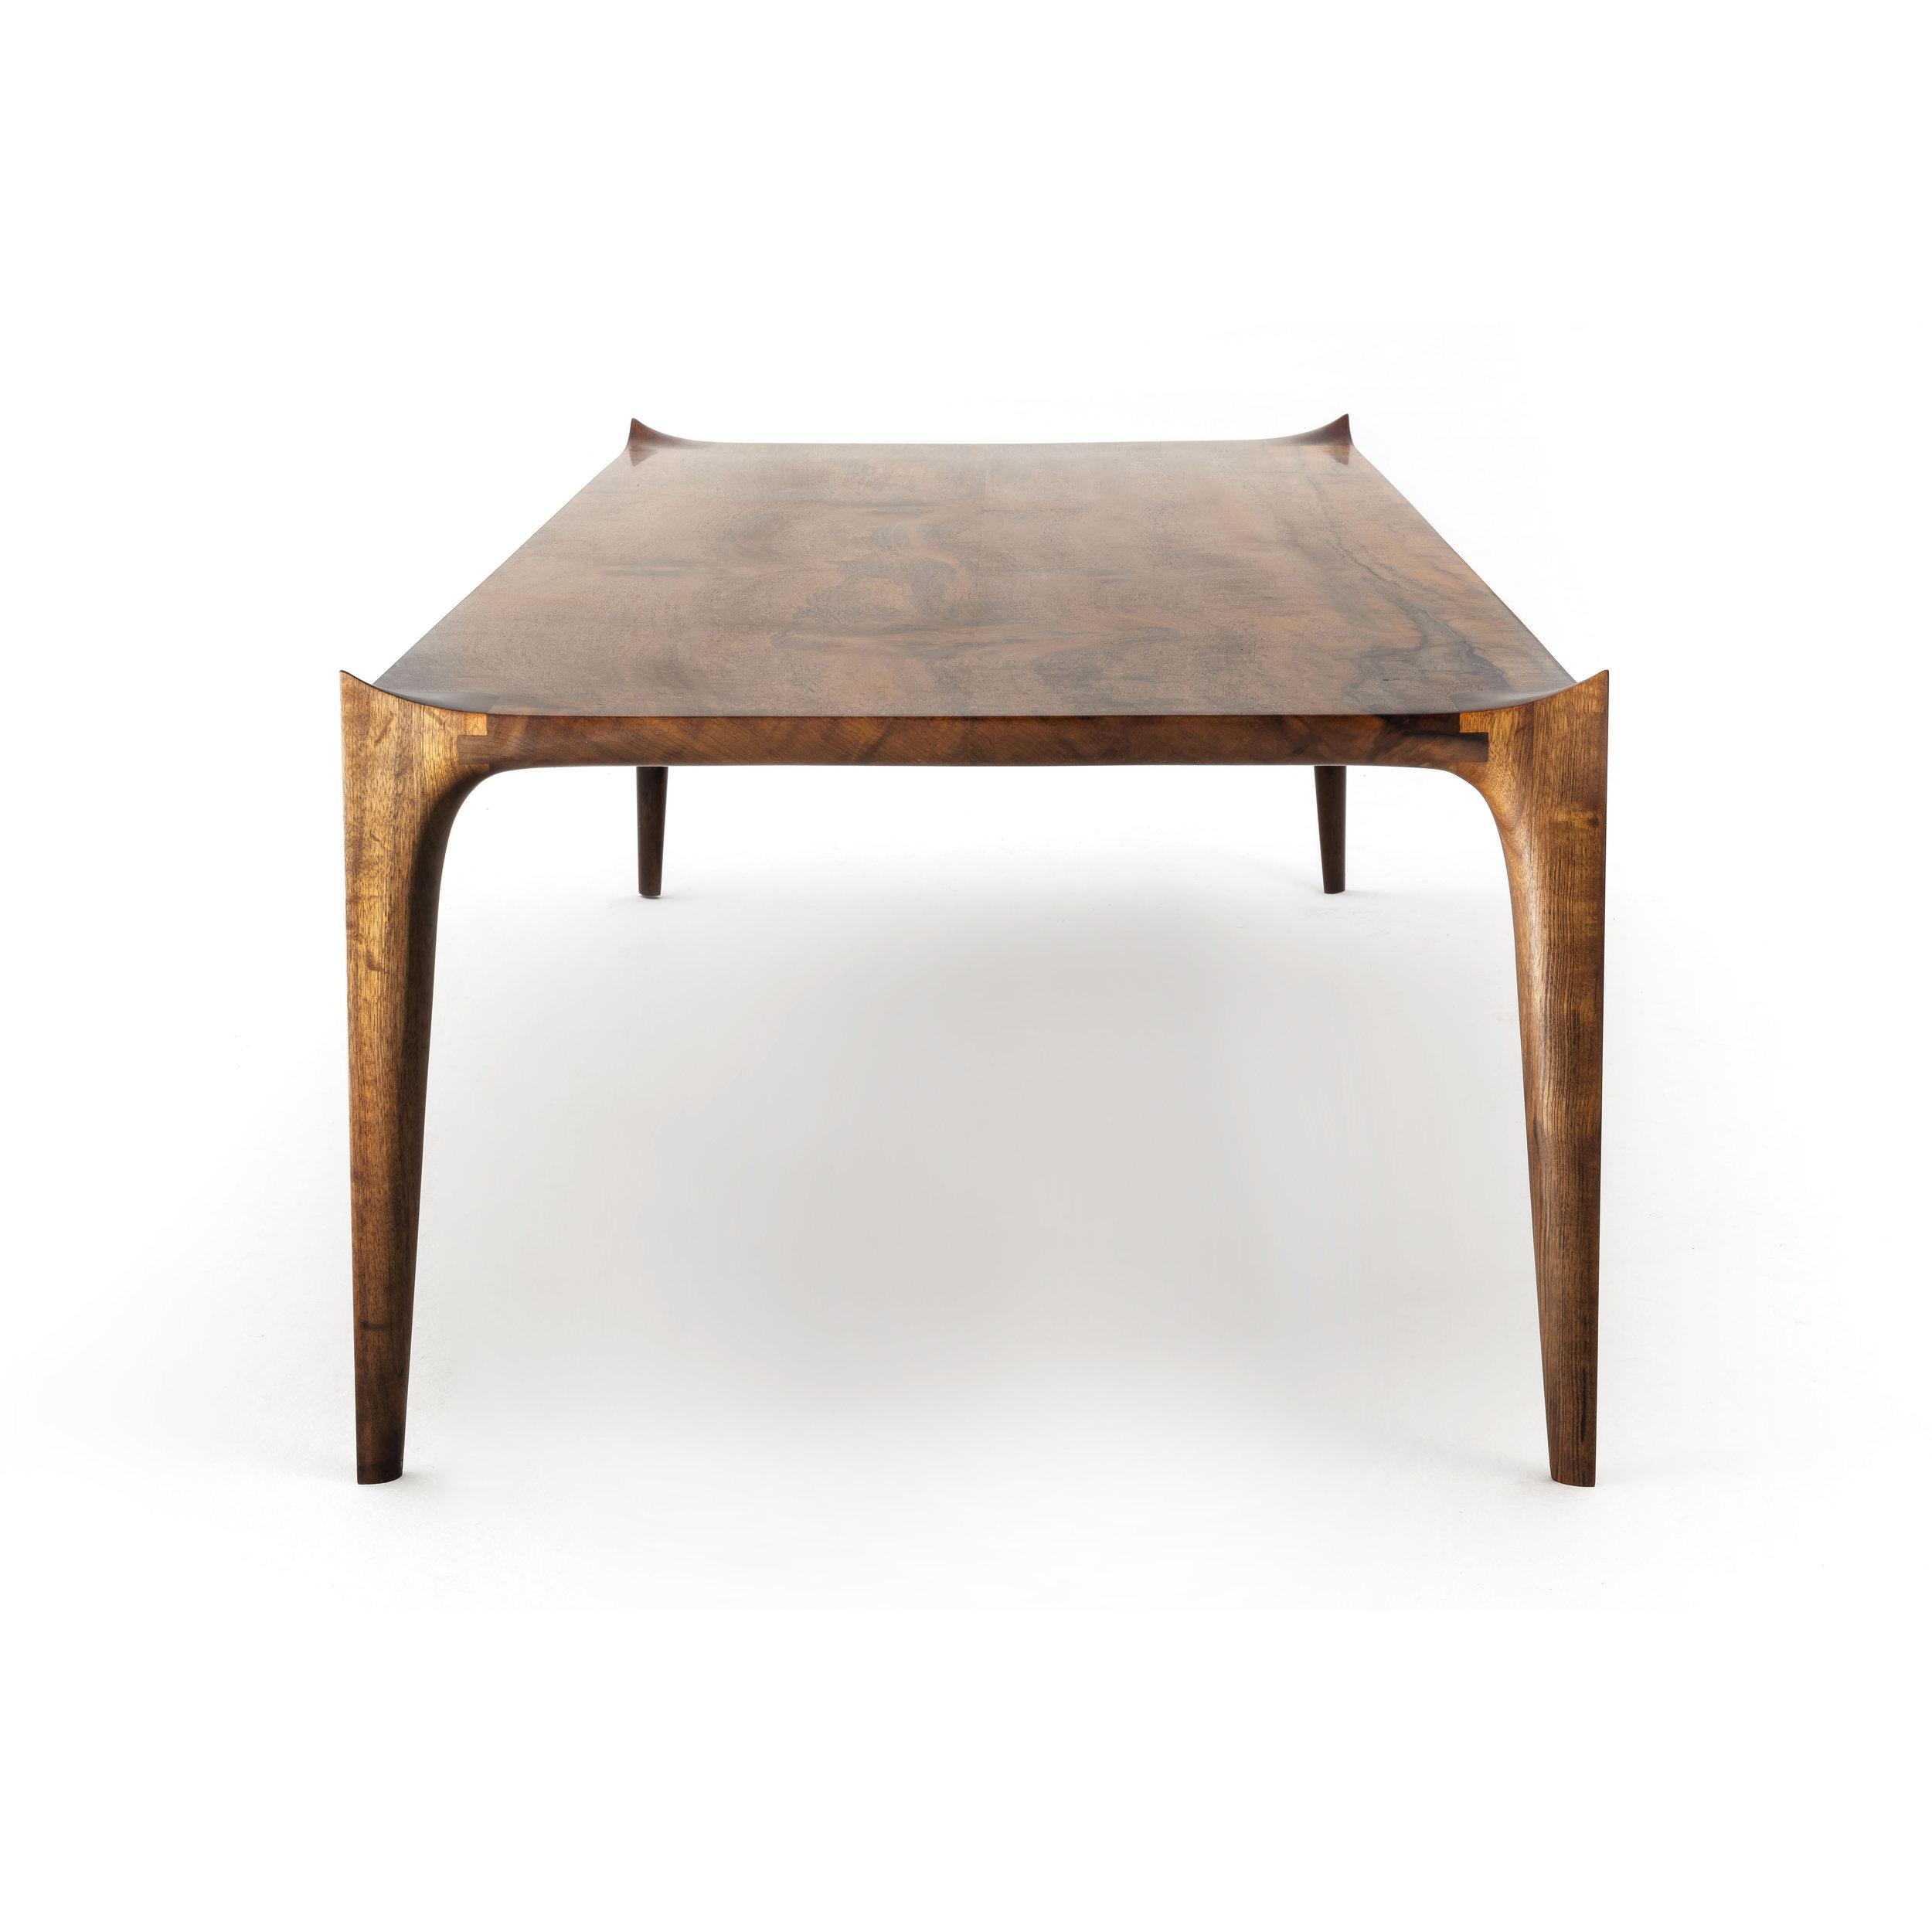 kou | tables -